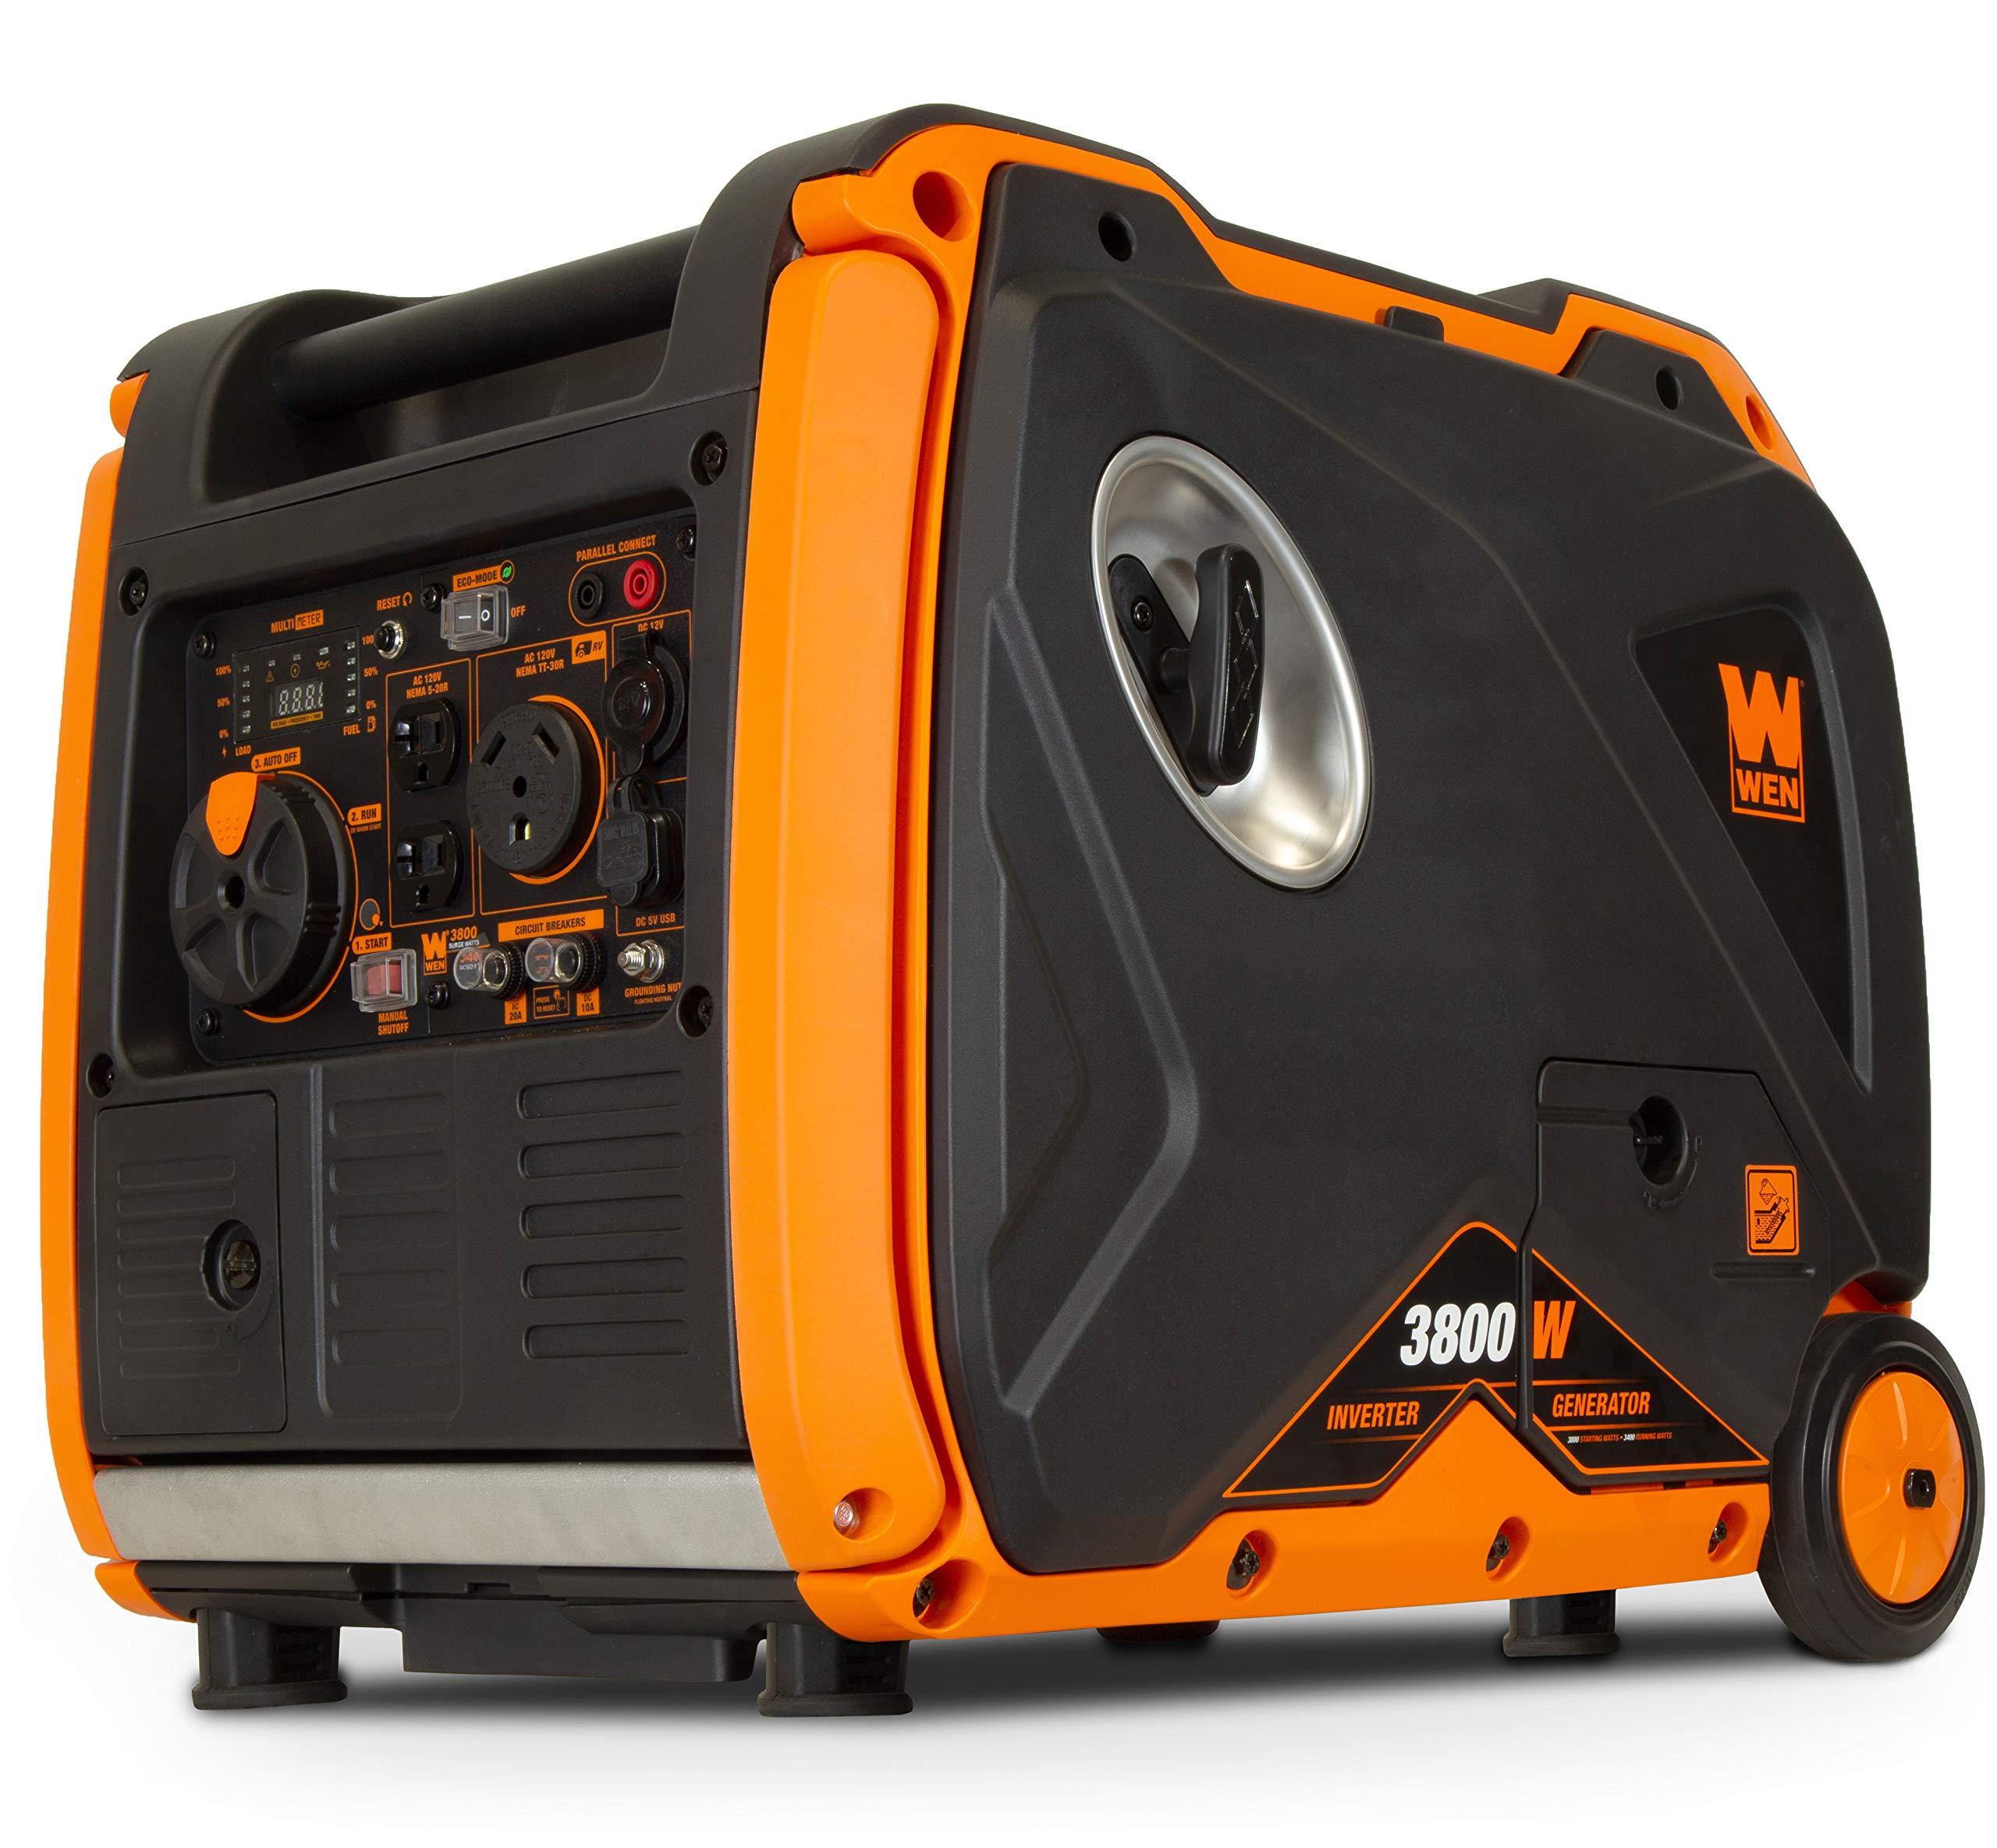 WEN 56380i Super Quiet 3800-Watt Portable Inverter Generator with Fuel Shut-Off and Electric Start by WEN